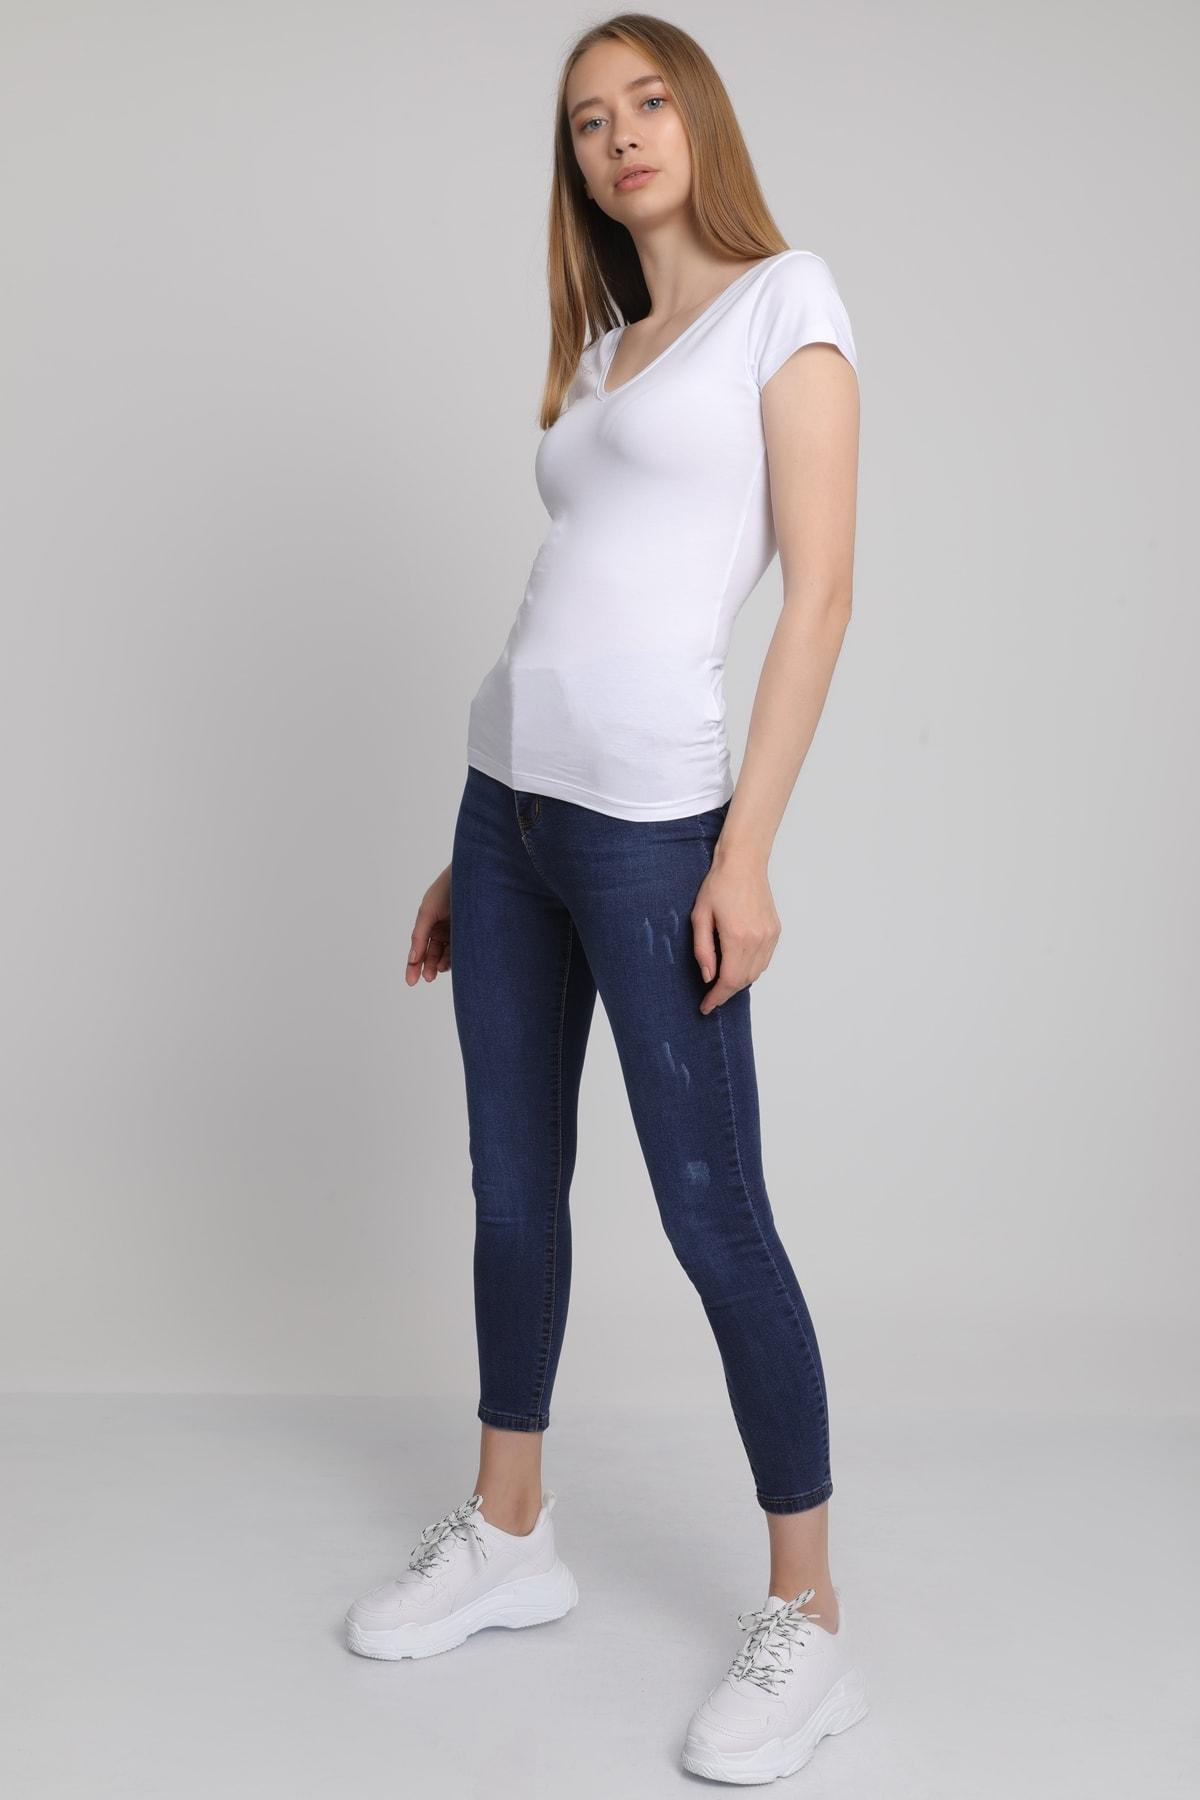 MD trend Kadın Beyaz Ön Arka V Yaka T-Shirt Mdt3472 2